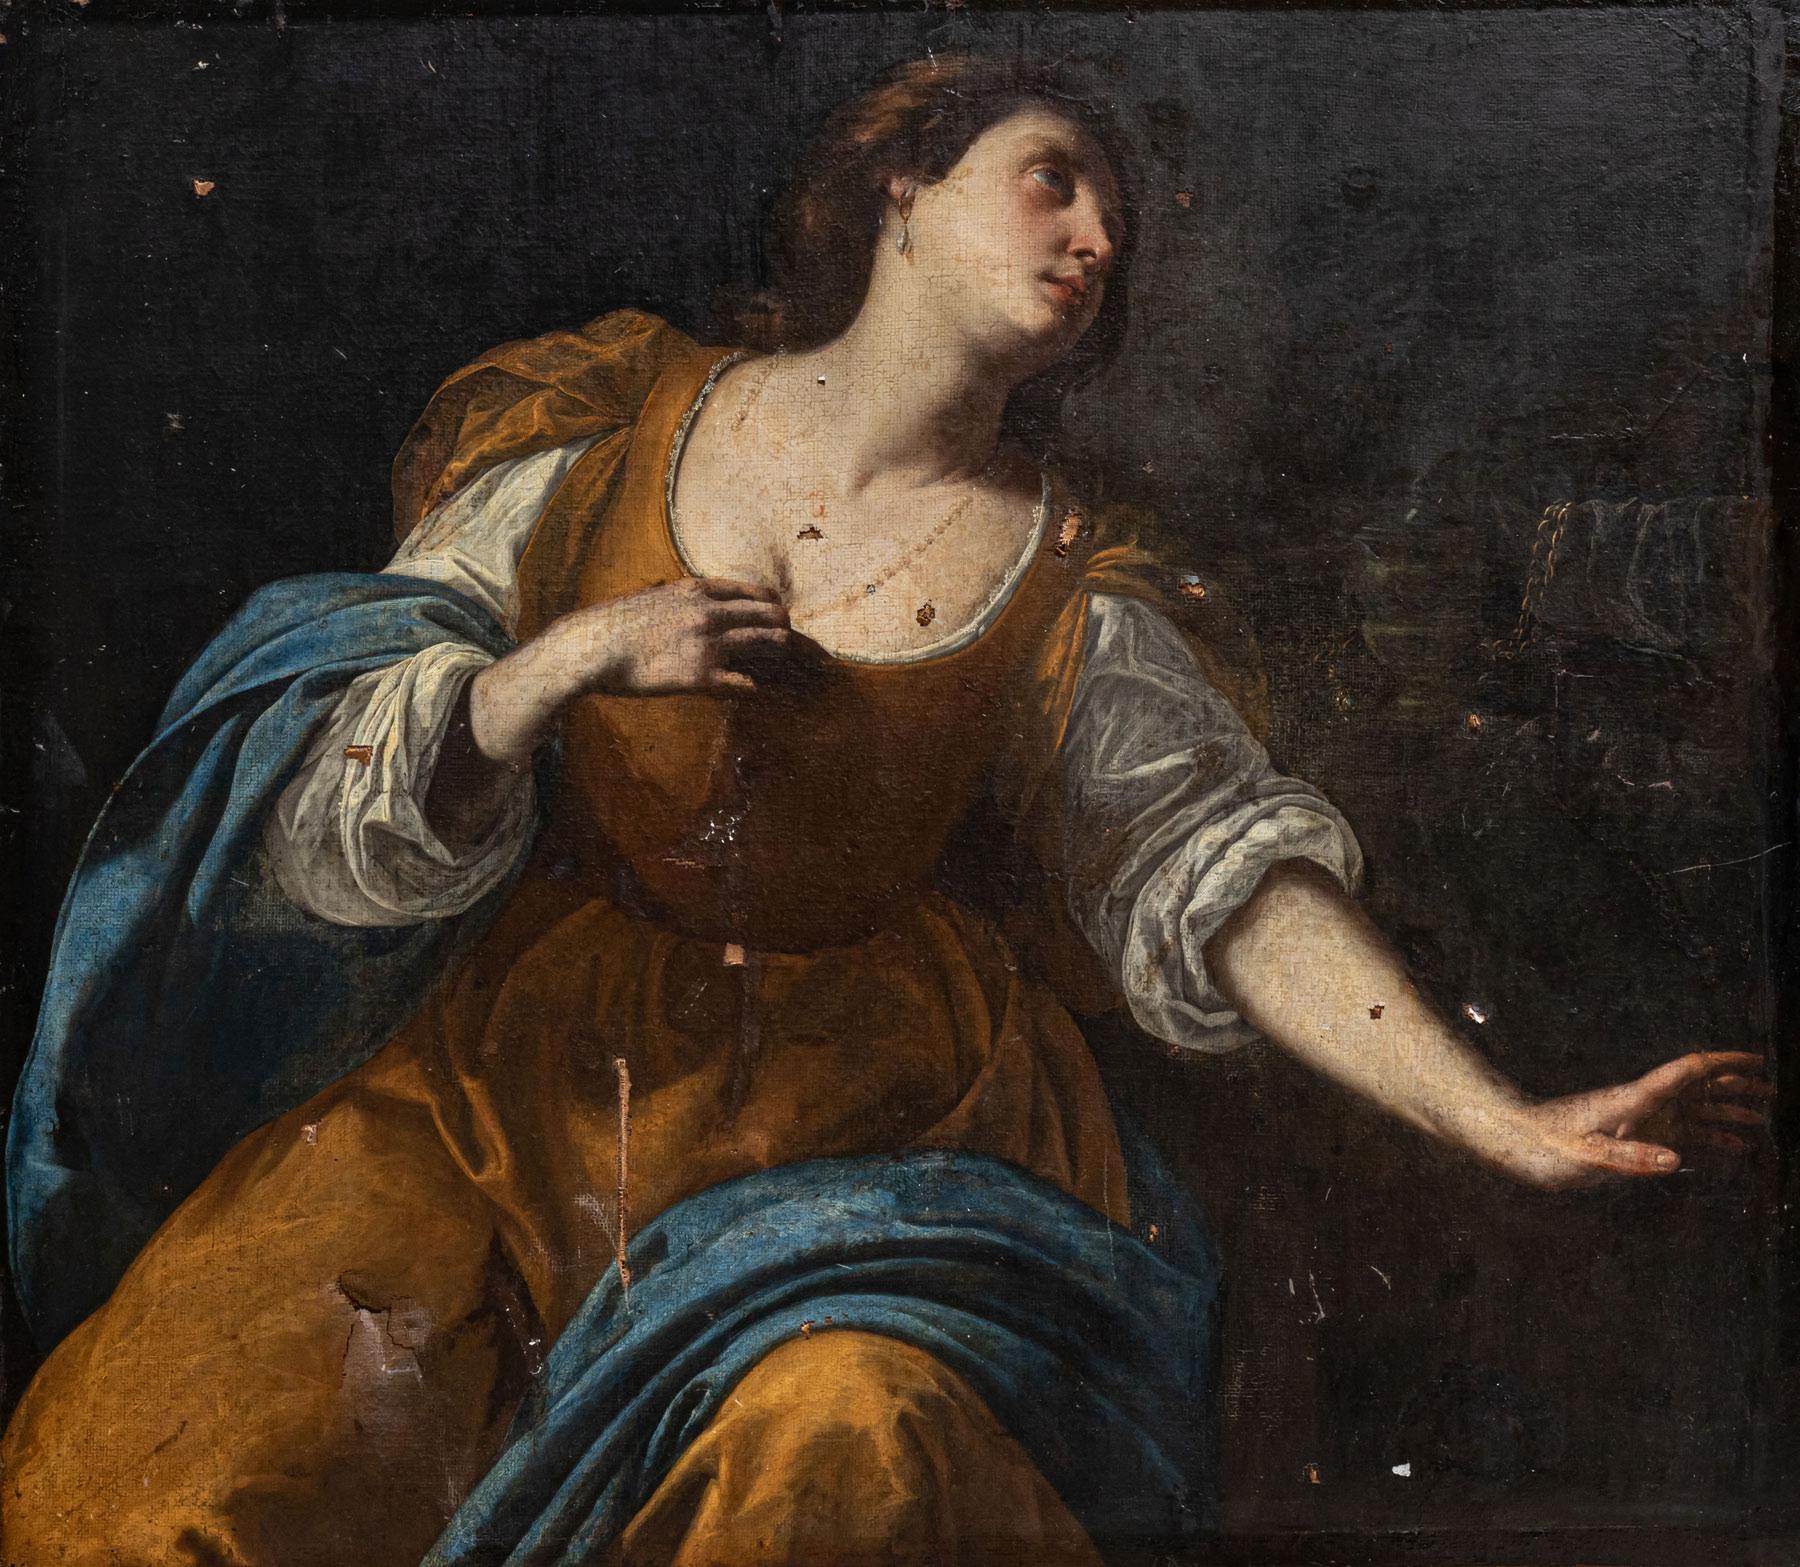 Artemisia Gentileschi, Maria Maddalena (1630-1631; olio su tela, 102 x 118 cm; Beirut, Sursock Palace Collection)